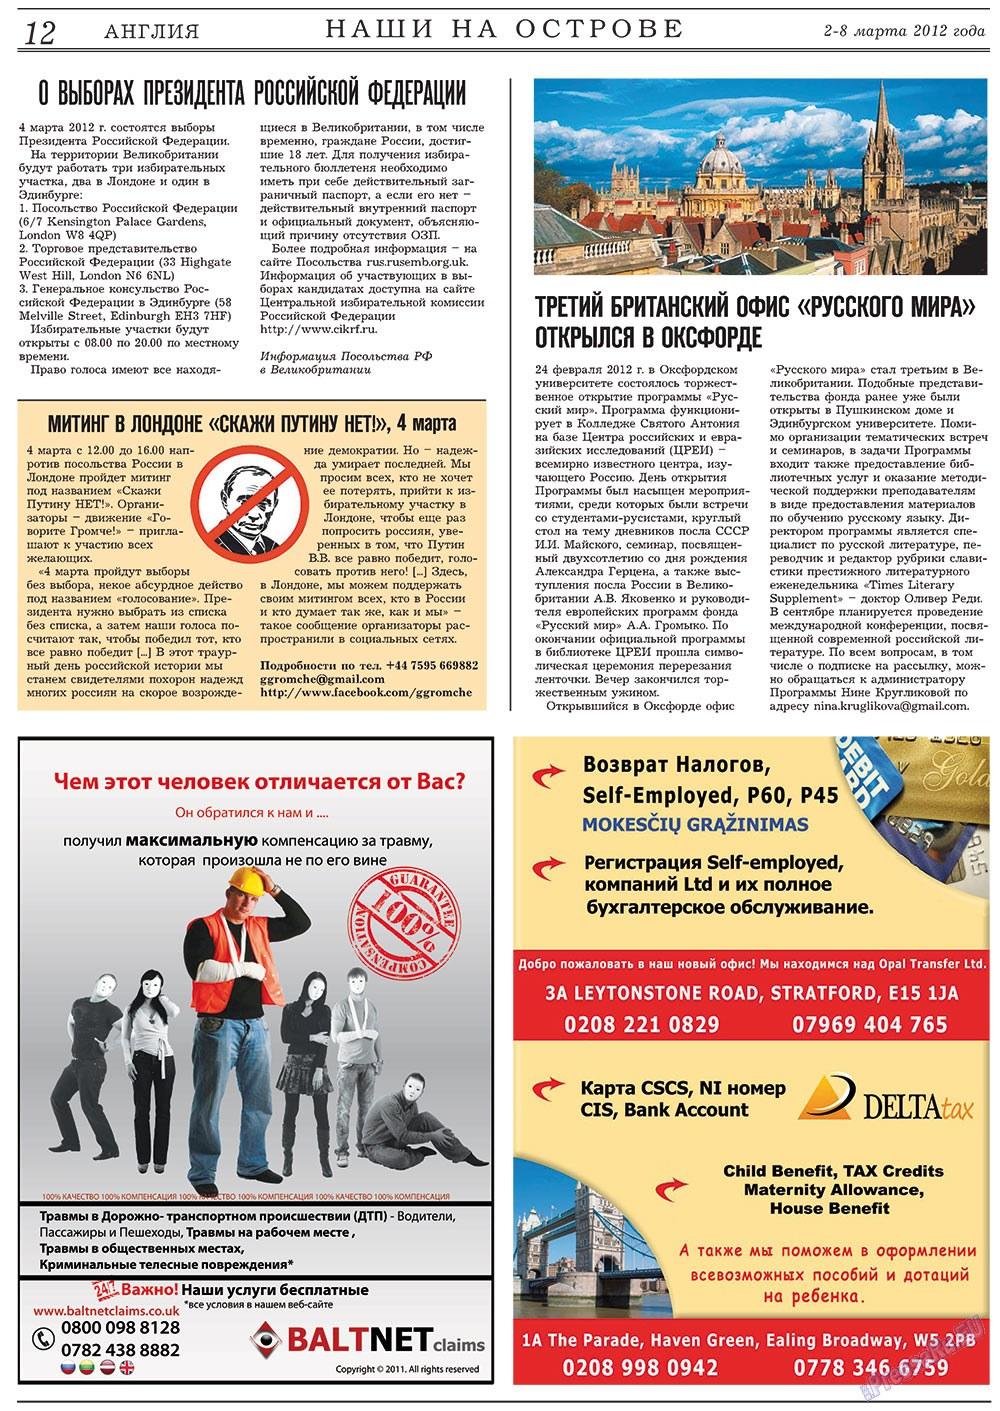 Англия (газета). 2012 год, номер 8, стр. 12